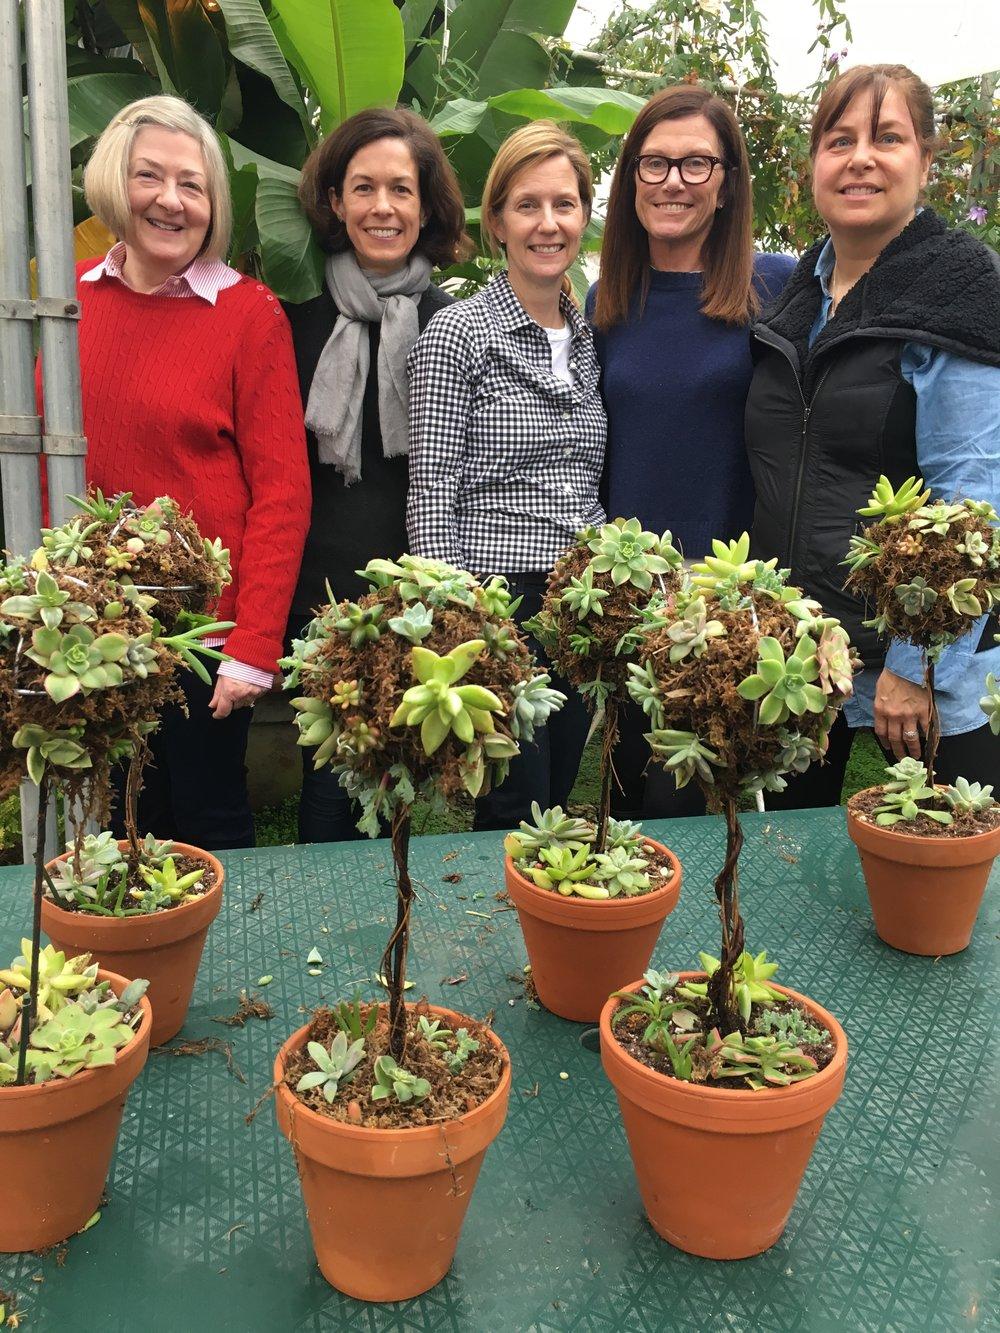 L to R: Carol Provan, Lisa Mortimer, Lynn Lehmann, Caroline Borrow, Robin McIntosh and their topiaries